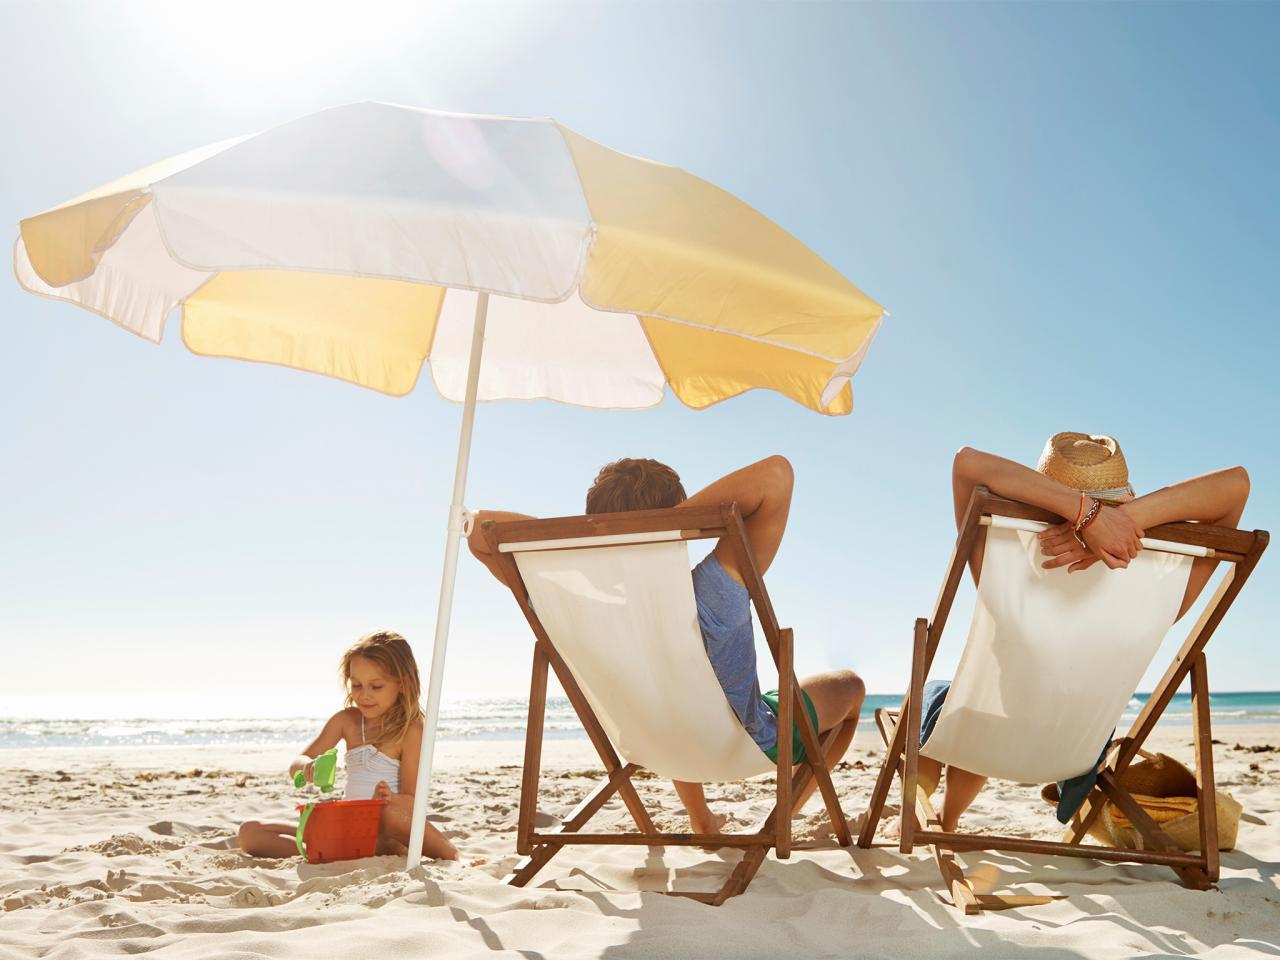 Cheap Family Weekend Getaways  TravelChannelcom  Travel